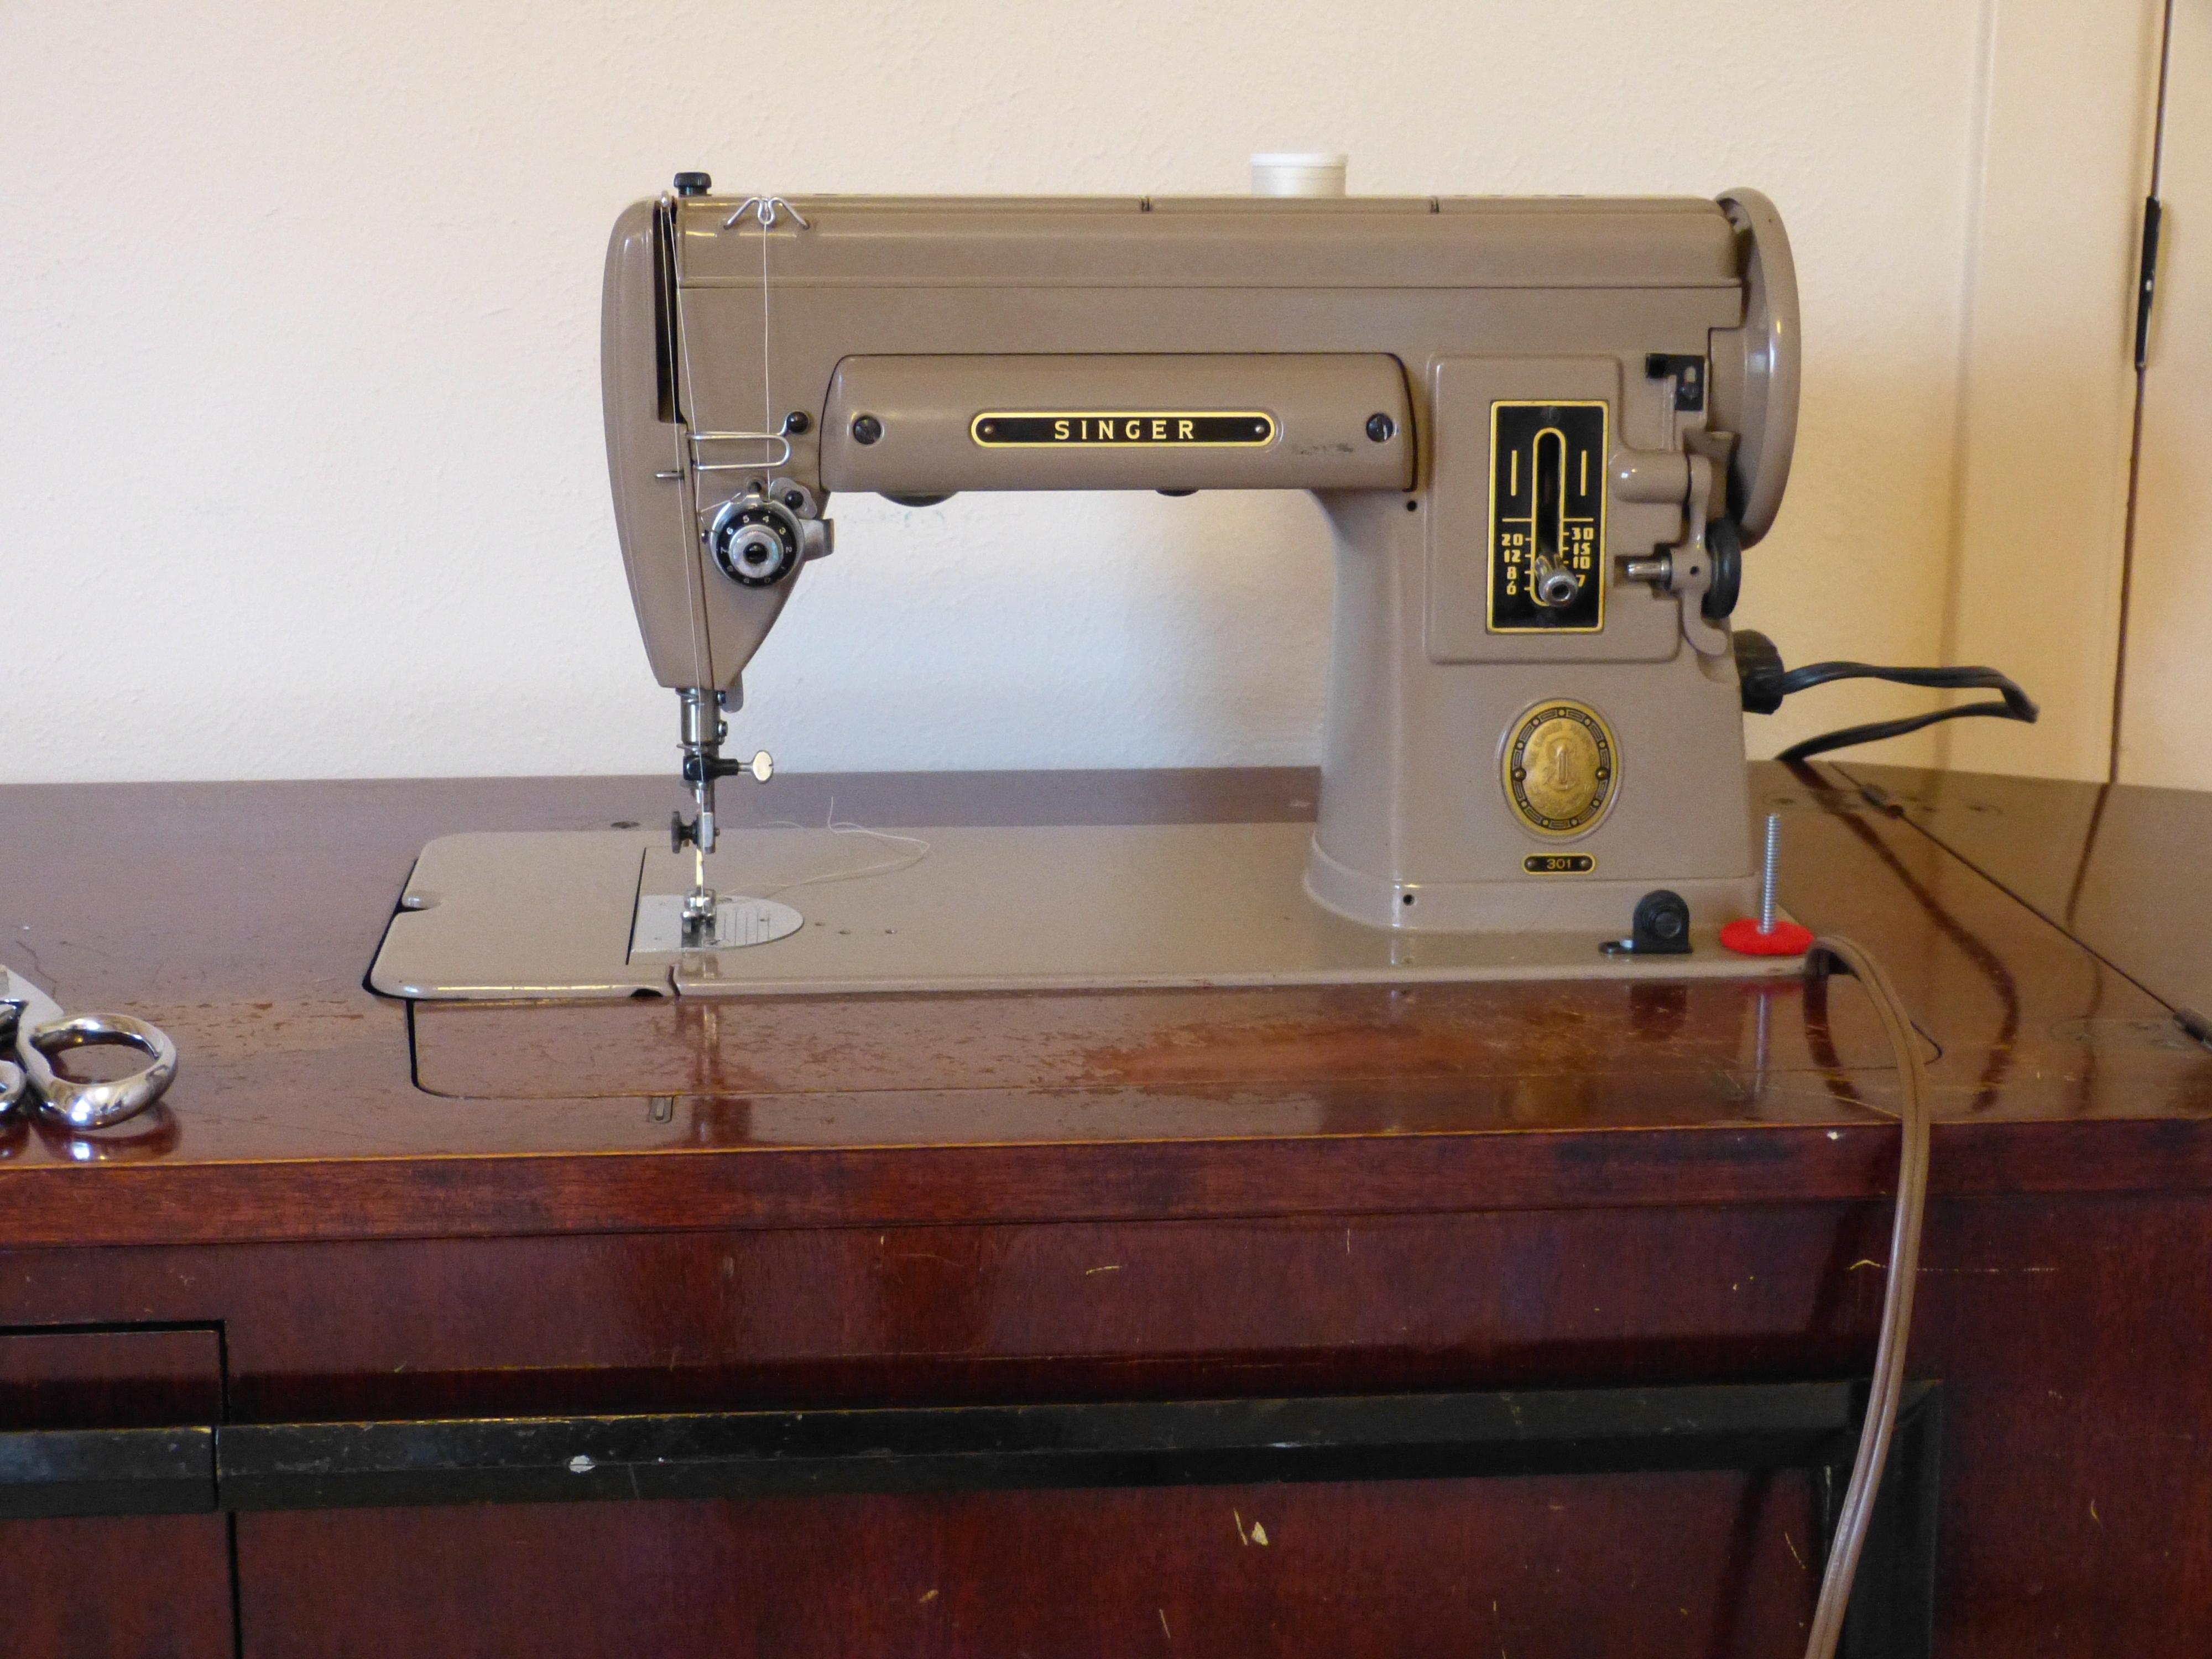 Picture A Vintage Sewing Machine A Closet Morse Sewing Machine Manual Morse Sewing Machine 200 houzz 01 Morse Sewing Machine